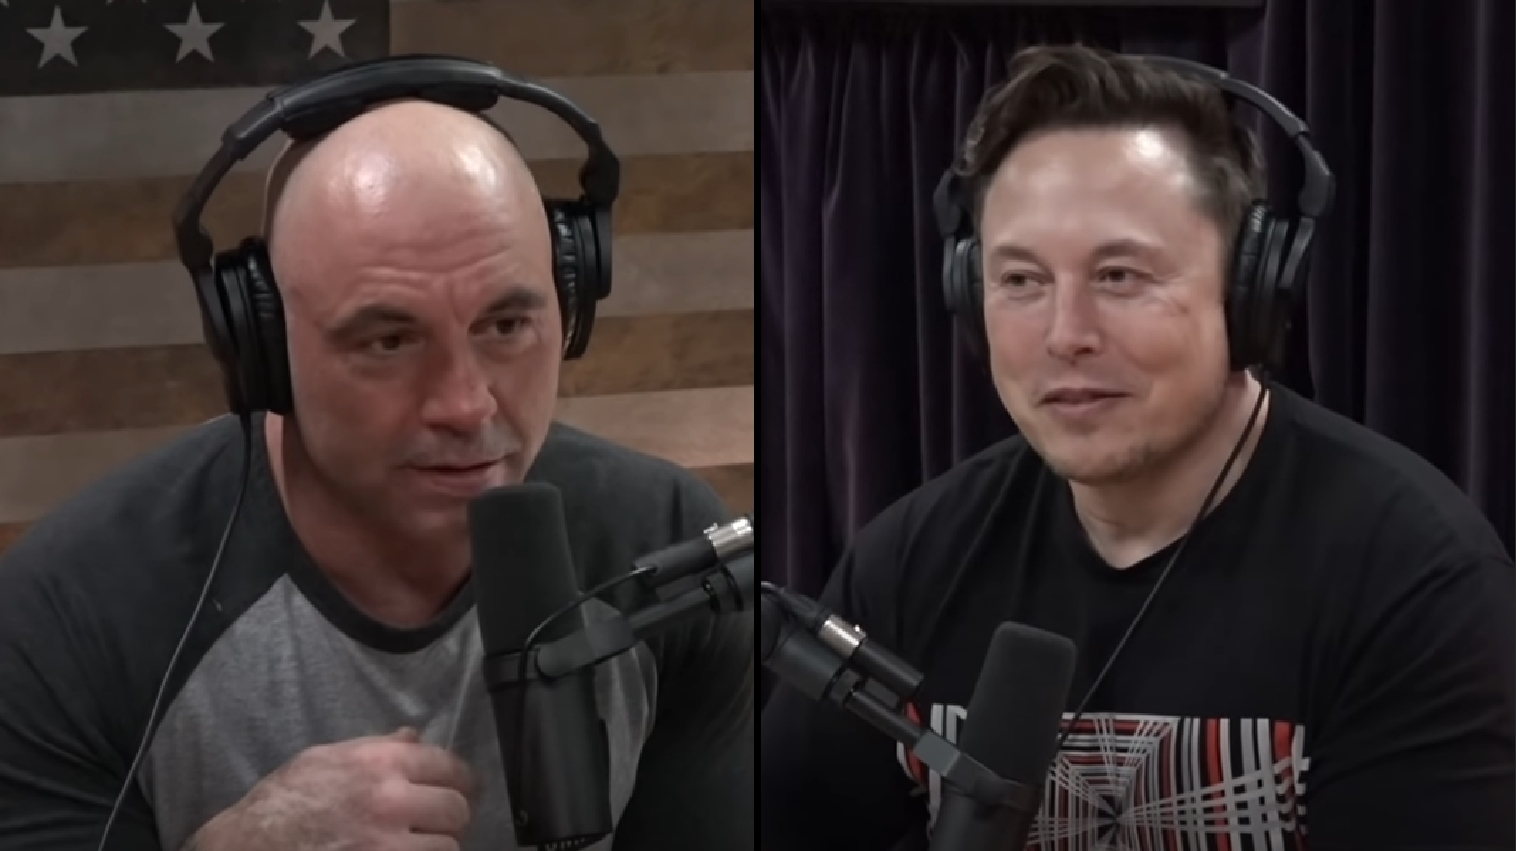 Joe Rogan and ELon Musk on the JRE podcast